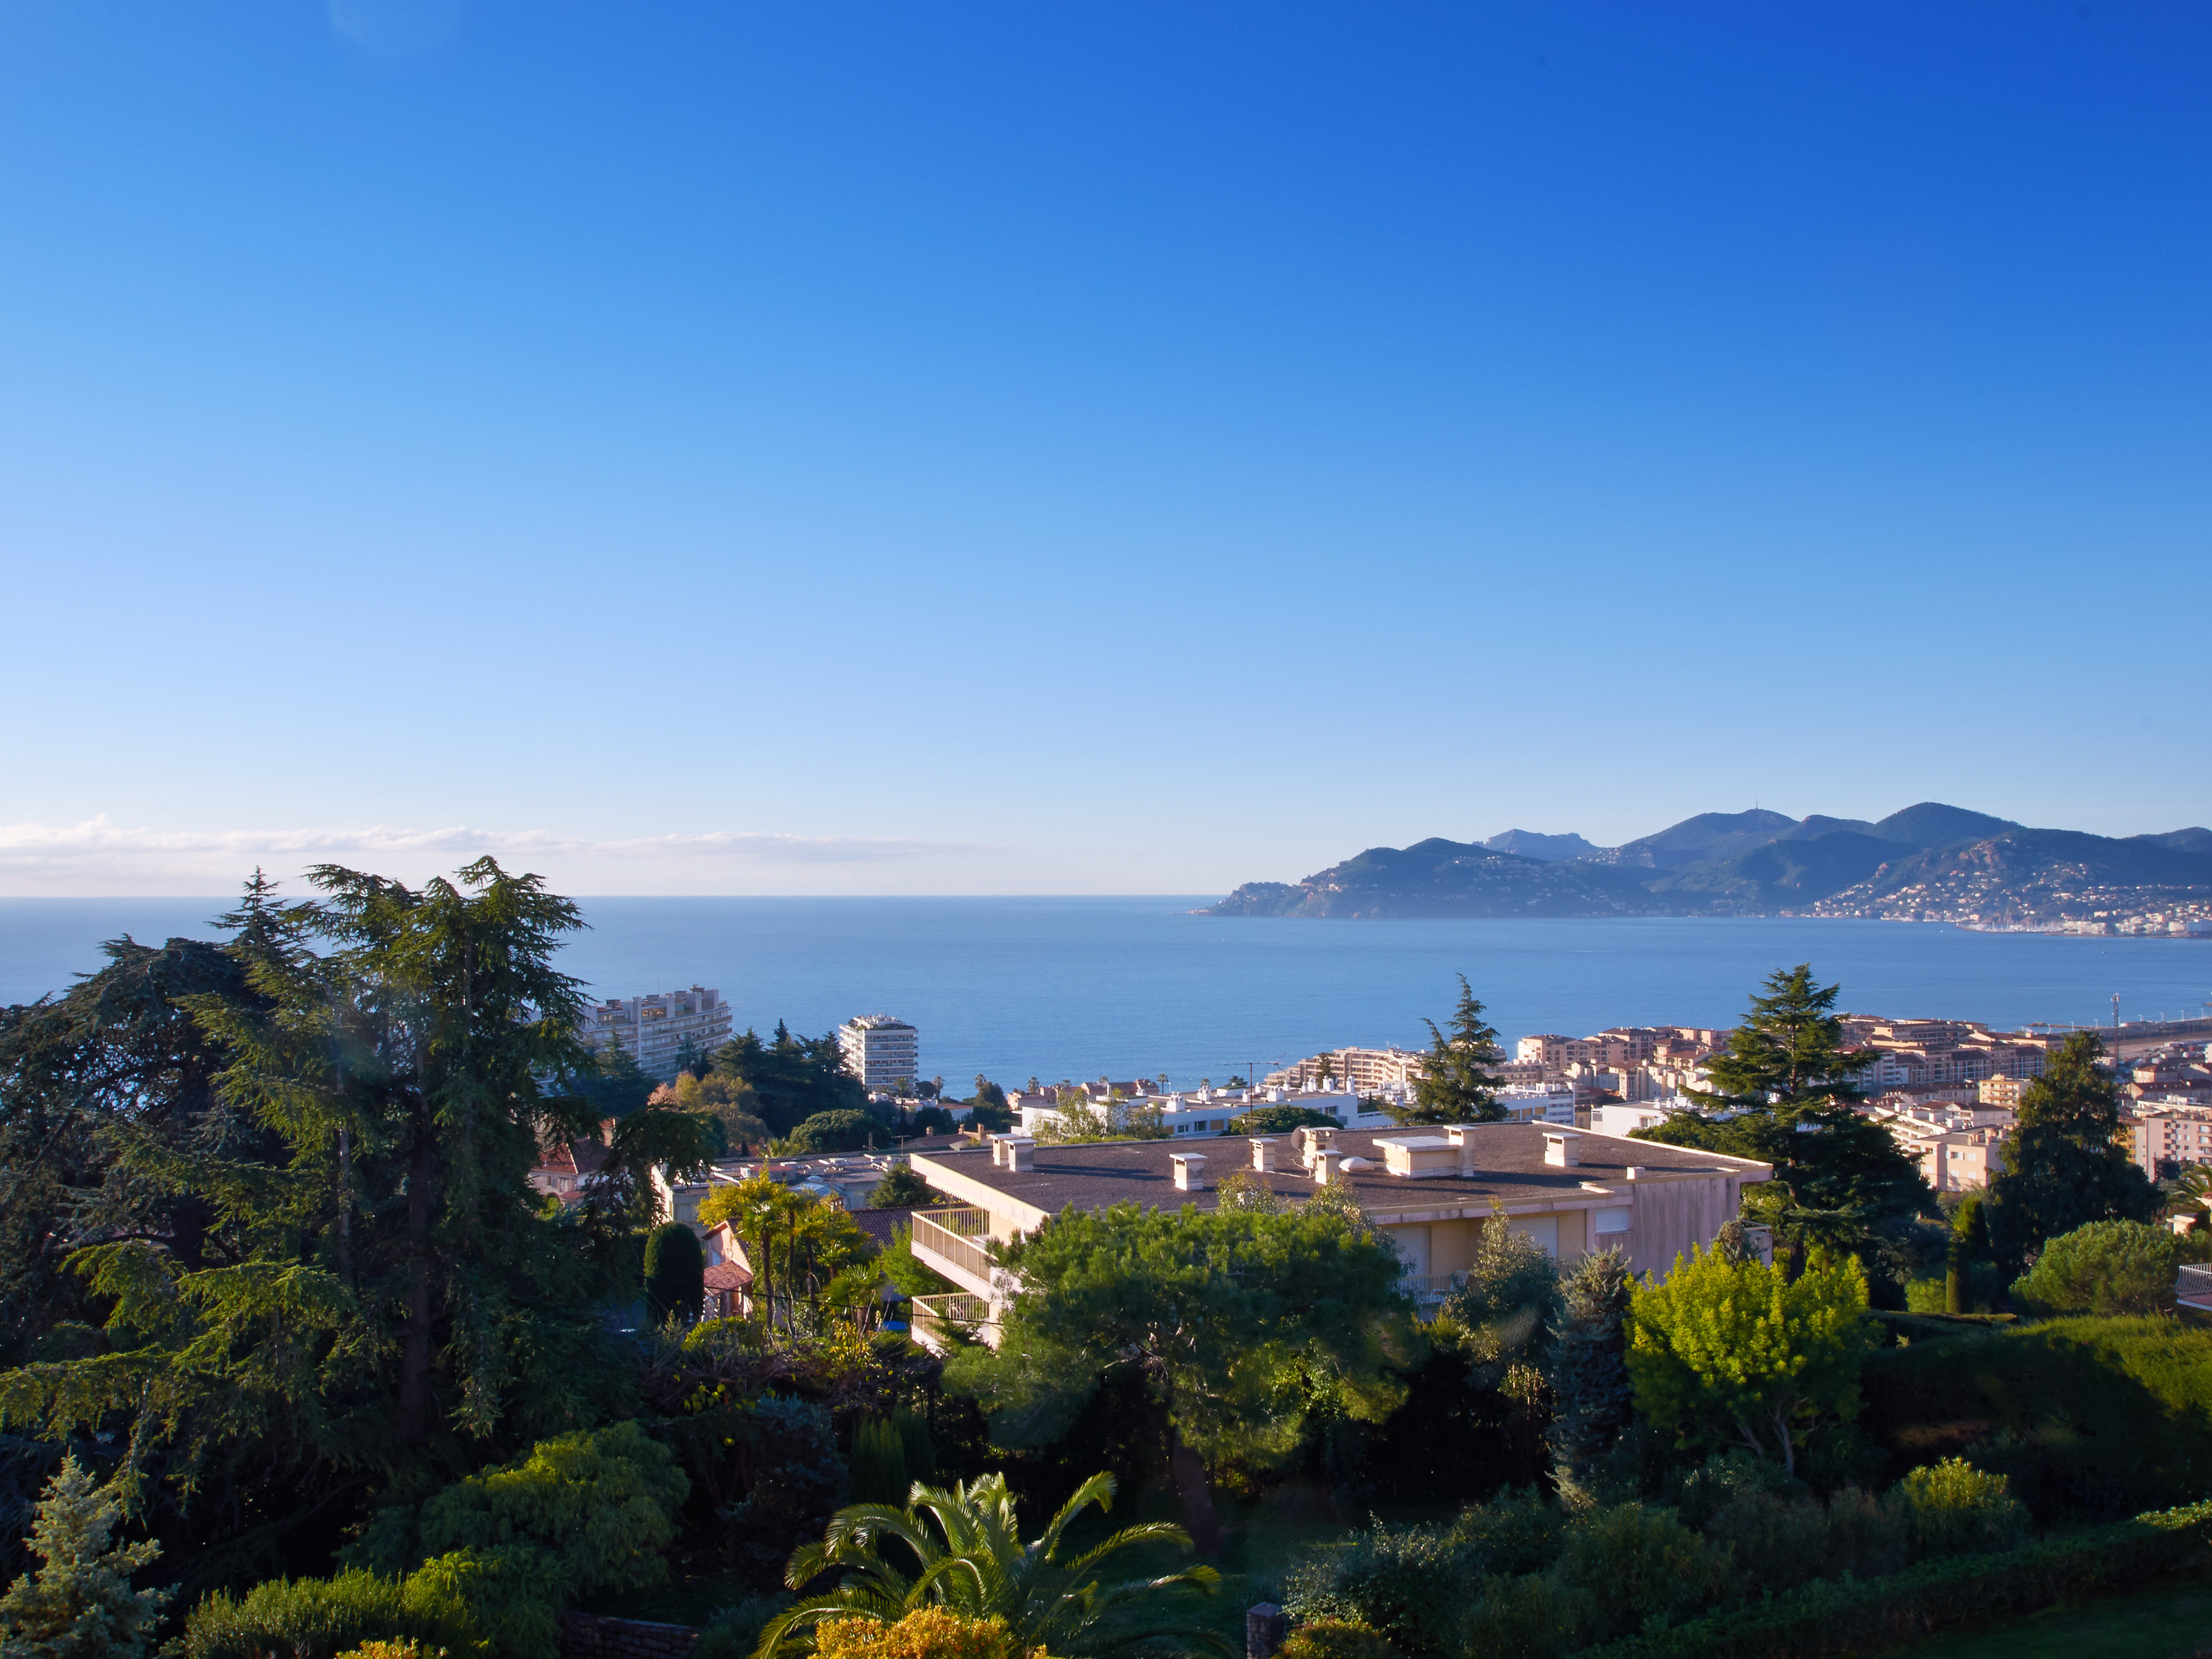 Apartamento para Venda às Panoramic sea view and large terrace for this one bedroom apartment La Croix des Gardes Cannes, Provença-Alpes-Costa Azul 06150 França